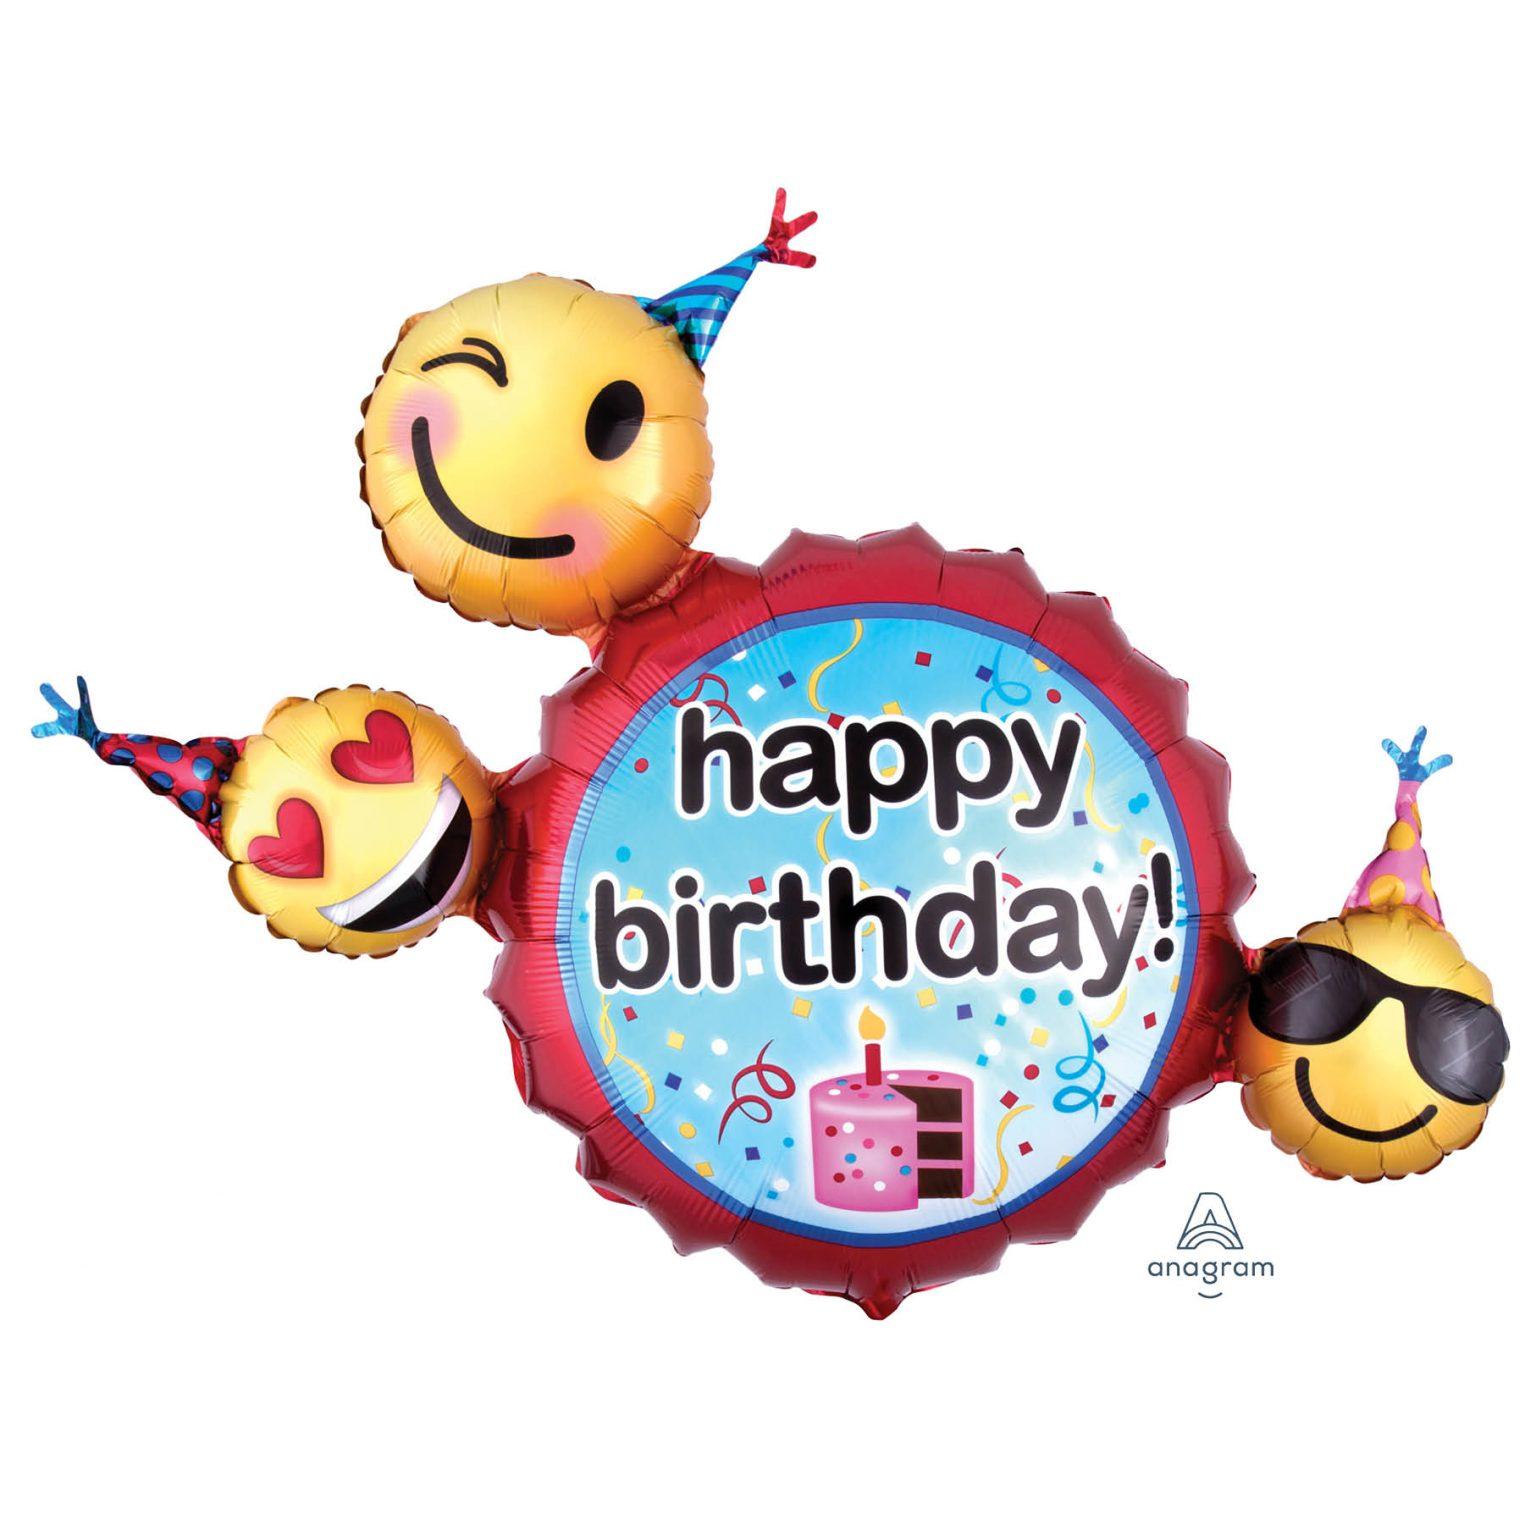 helium ballon emoticon birthday wishes